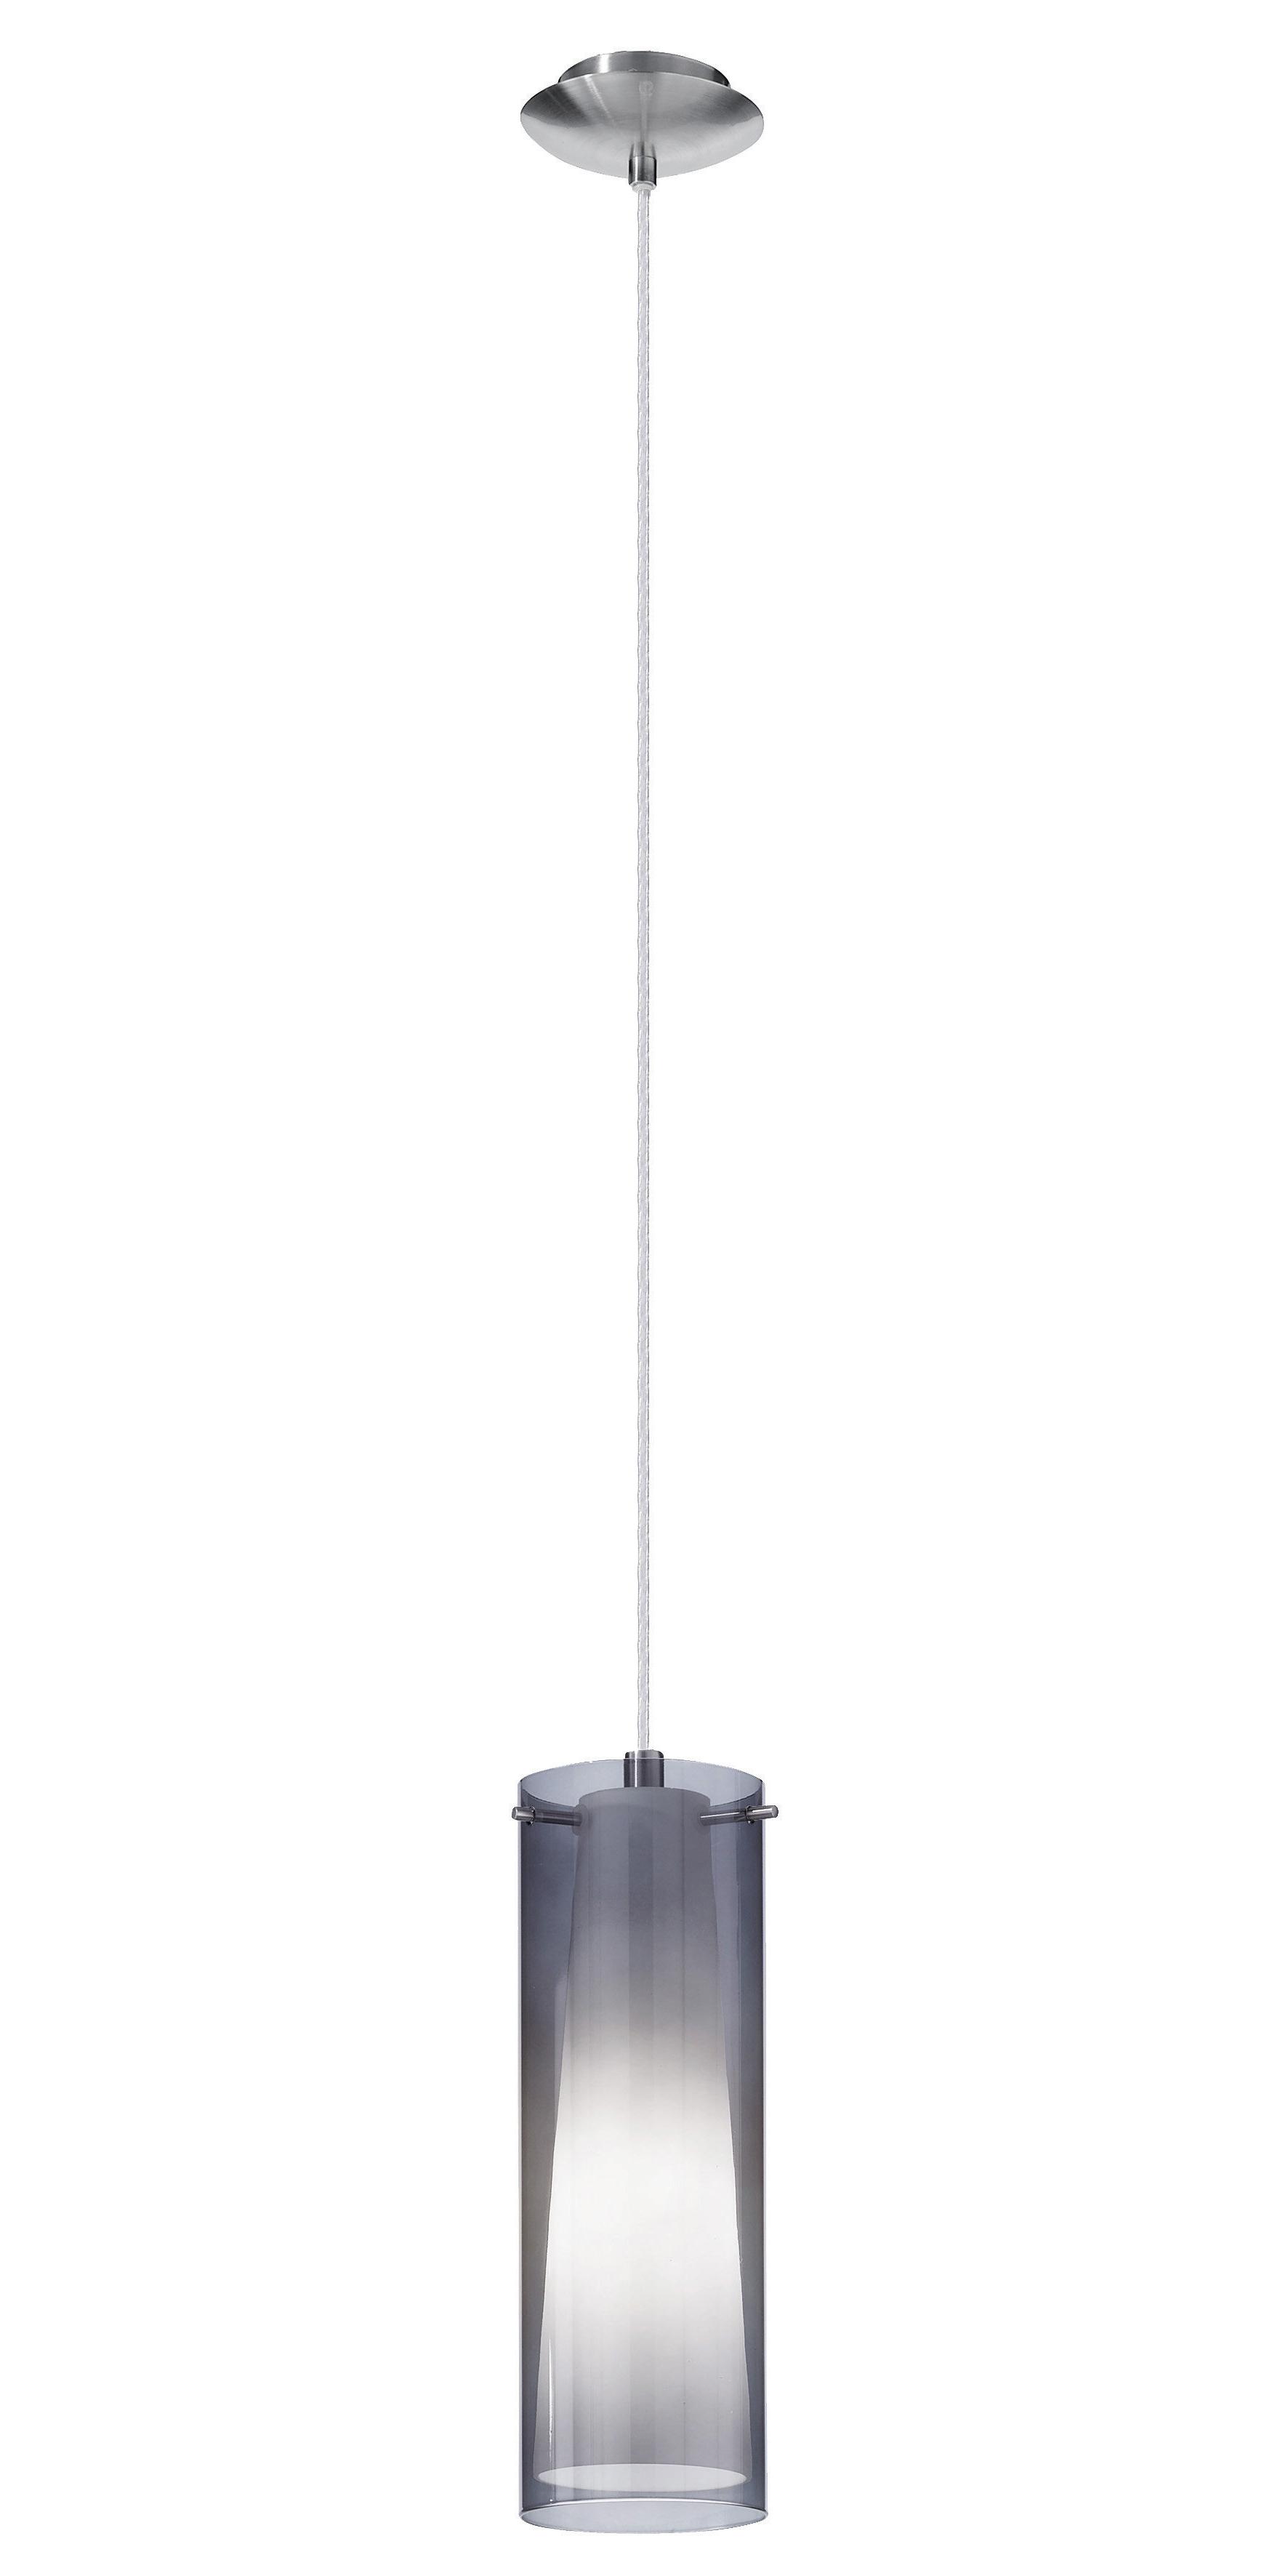 Brayden Studio Julia 1 Light Single Cylinder Pendant Intended For Current Oldbury 1 Light Single Cylinder Pendants (View 16 of 25)